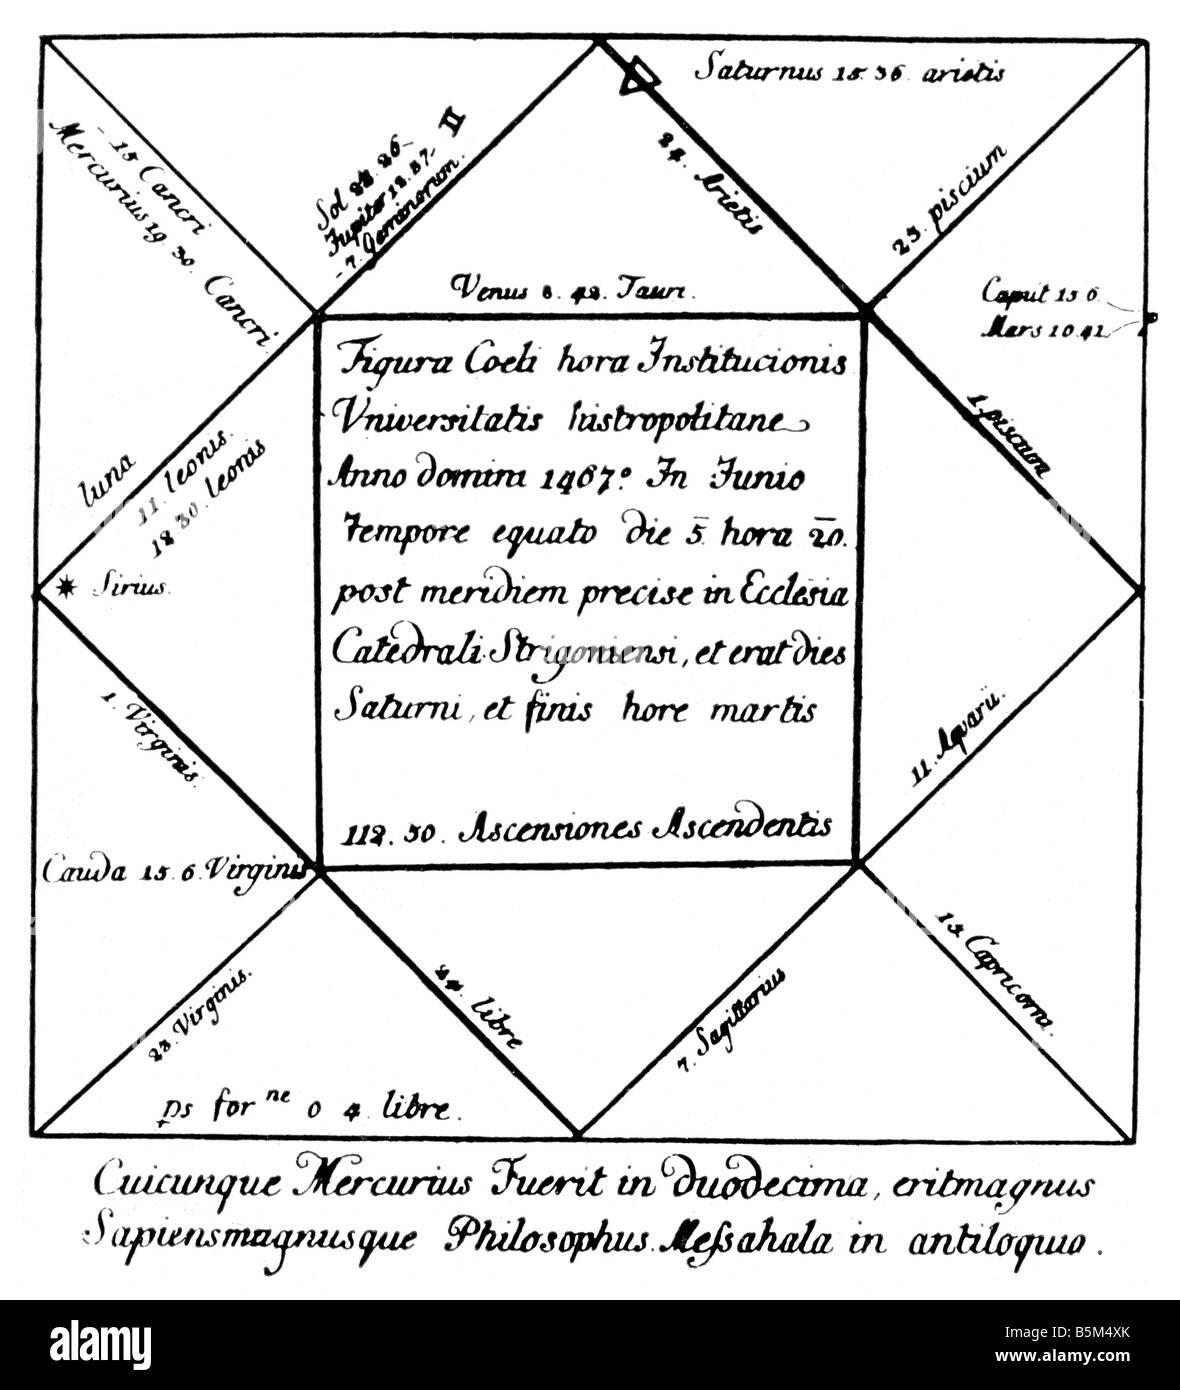 astrology, horoscope for the inauguration of Academia Istropolitana at Bratislava, made by Regiomontanus, 5.6.1467, - Stock Image